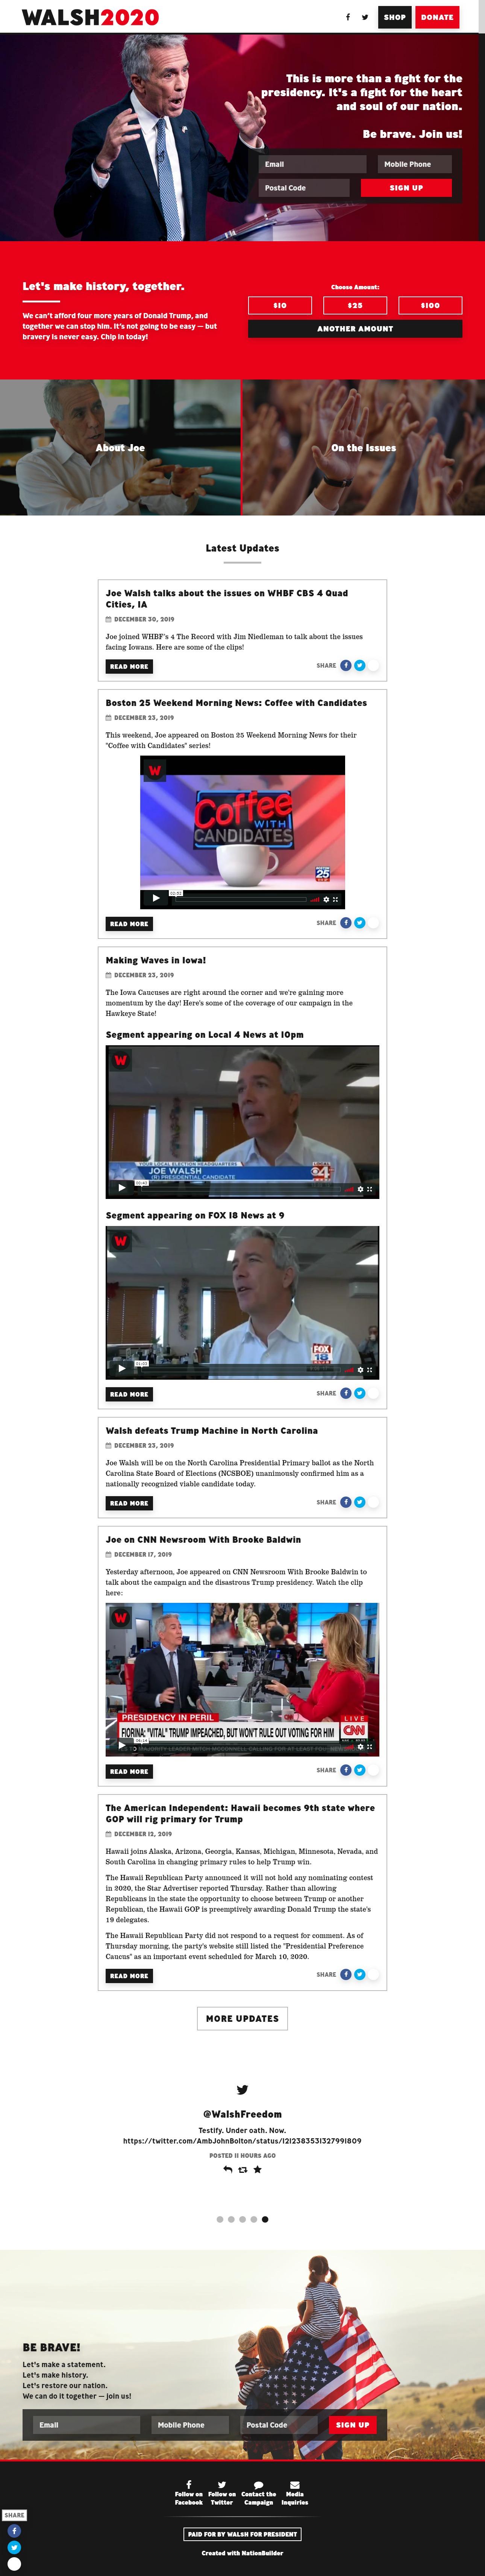 Homepage Snapshot for January 1, 2020: Former Representative Joe Walsh